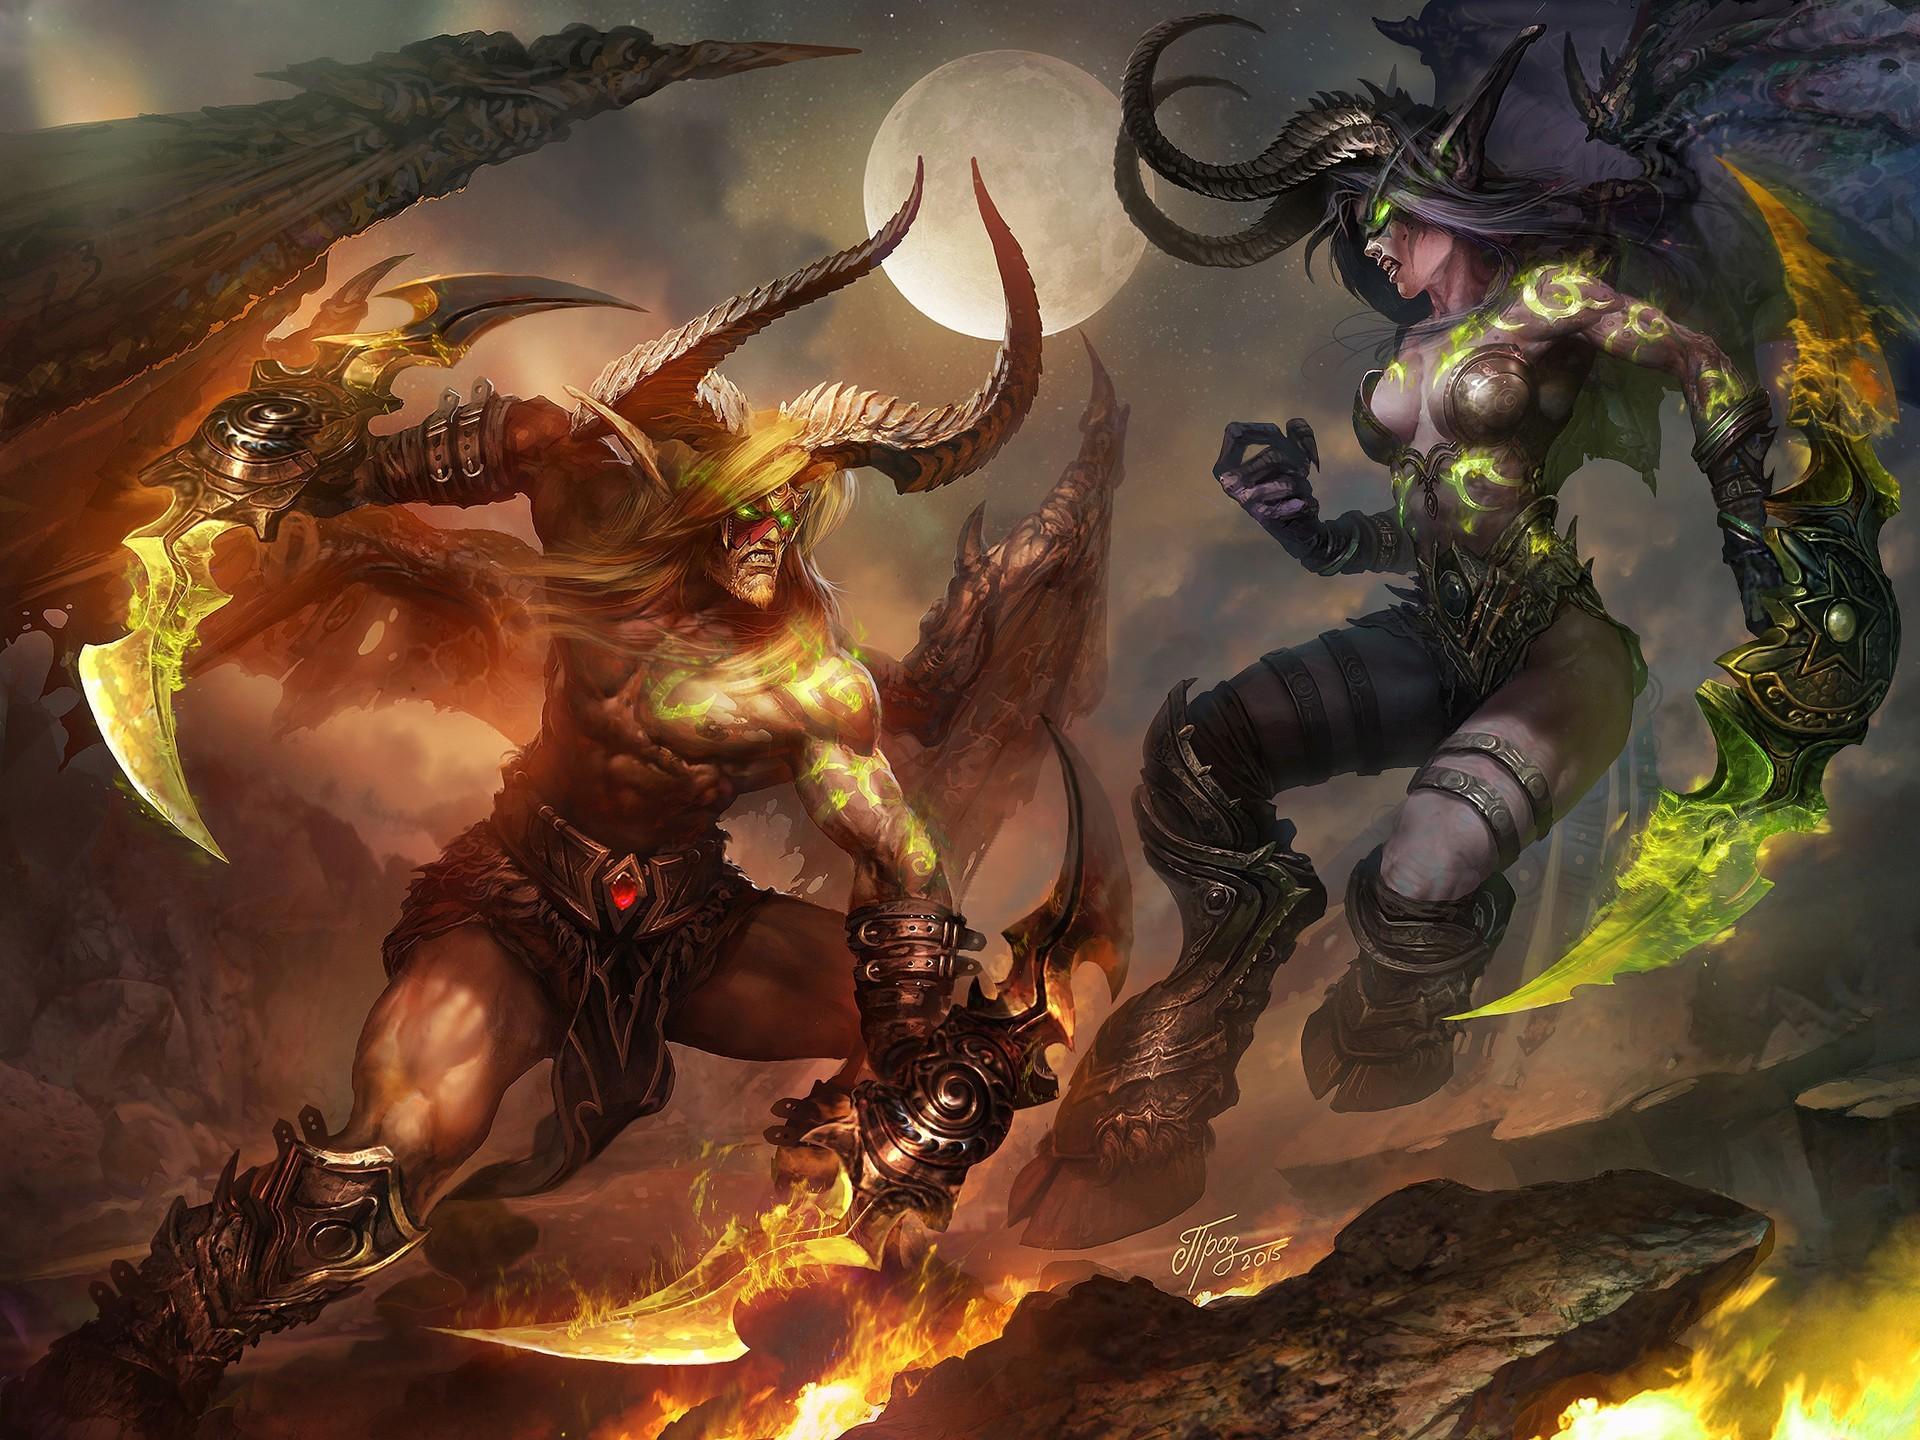 Demon Hunter, Blood Elf, Heroes of the storm, Warcraft, Night Elves, World  of Warcraft Wallpapers HD / Desktop and Mobile Backgrounds